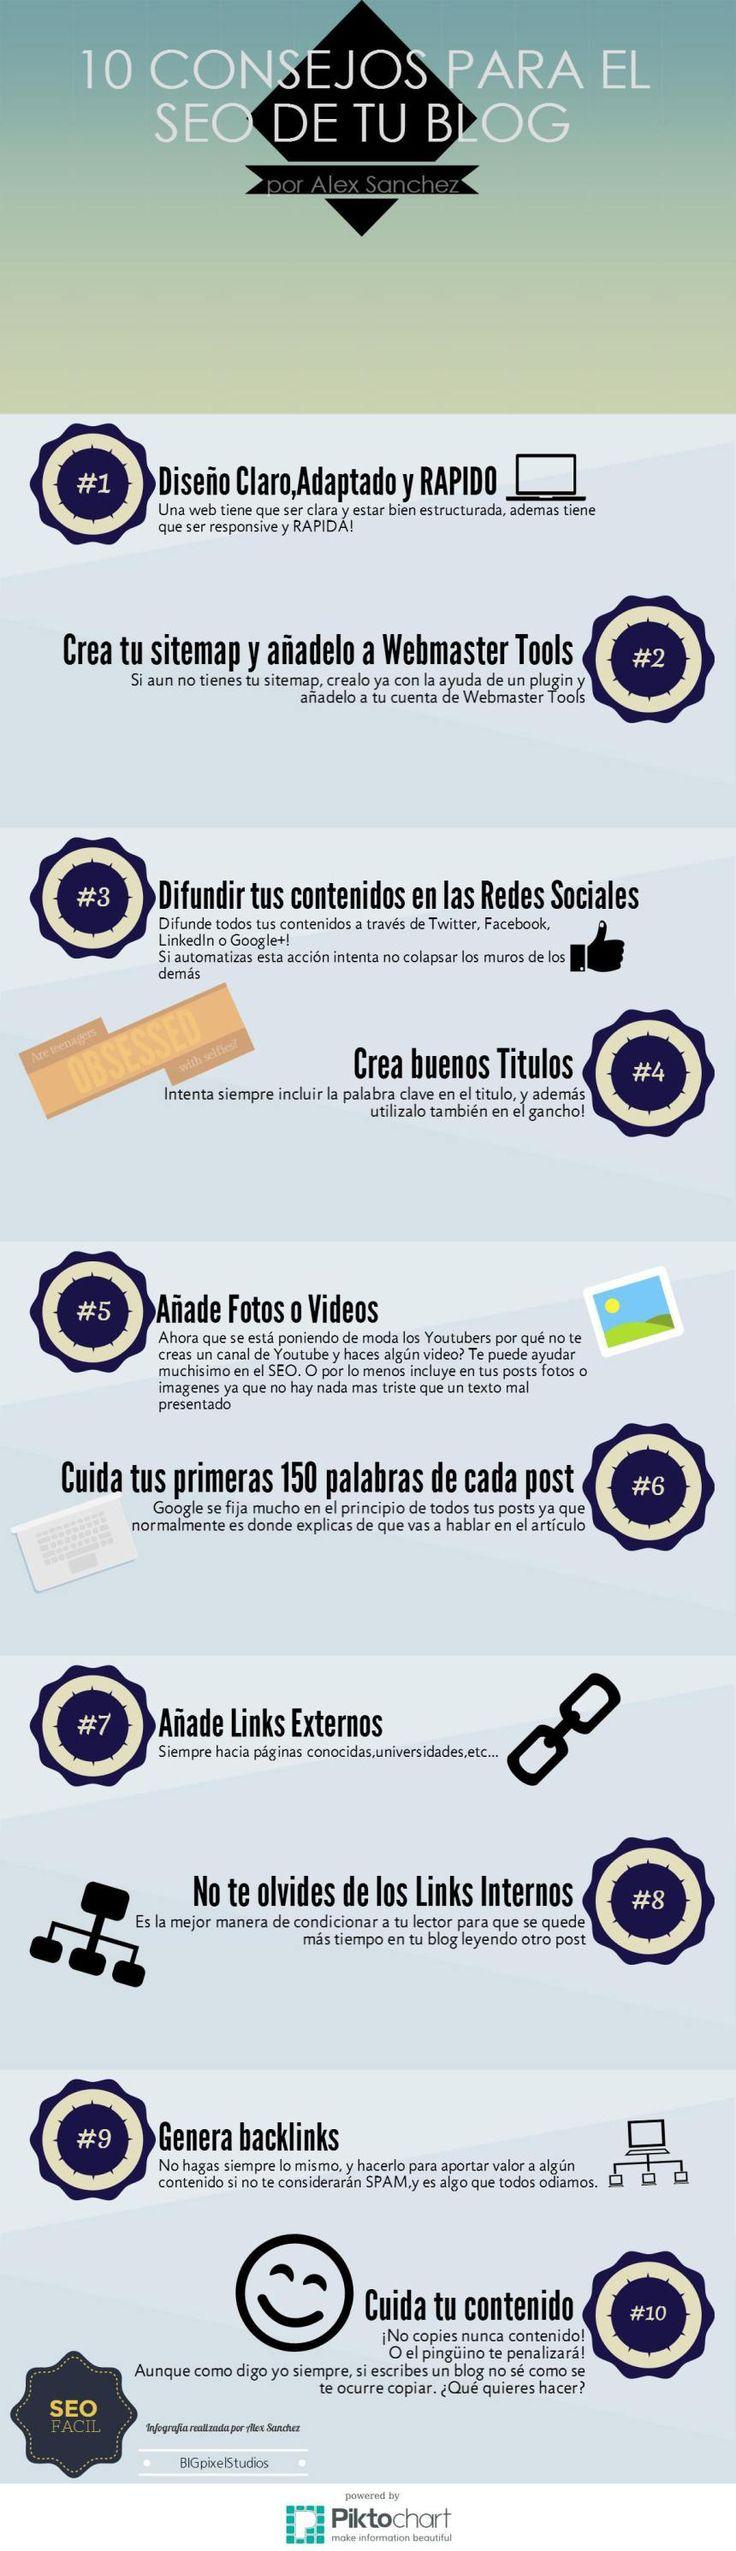 10 consejos para el SEO de tu Blog #infografia #infographic #socialmedia #seo